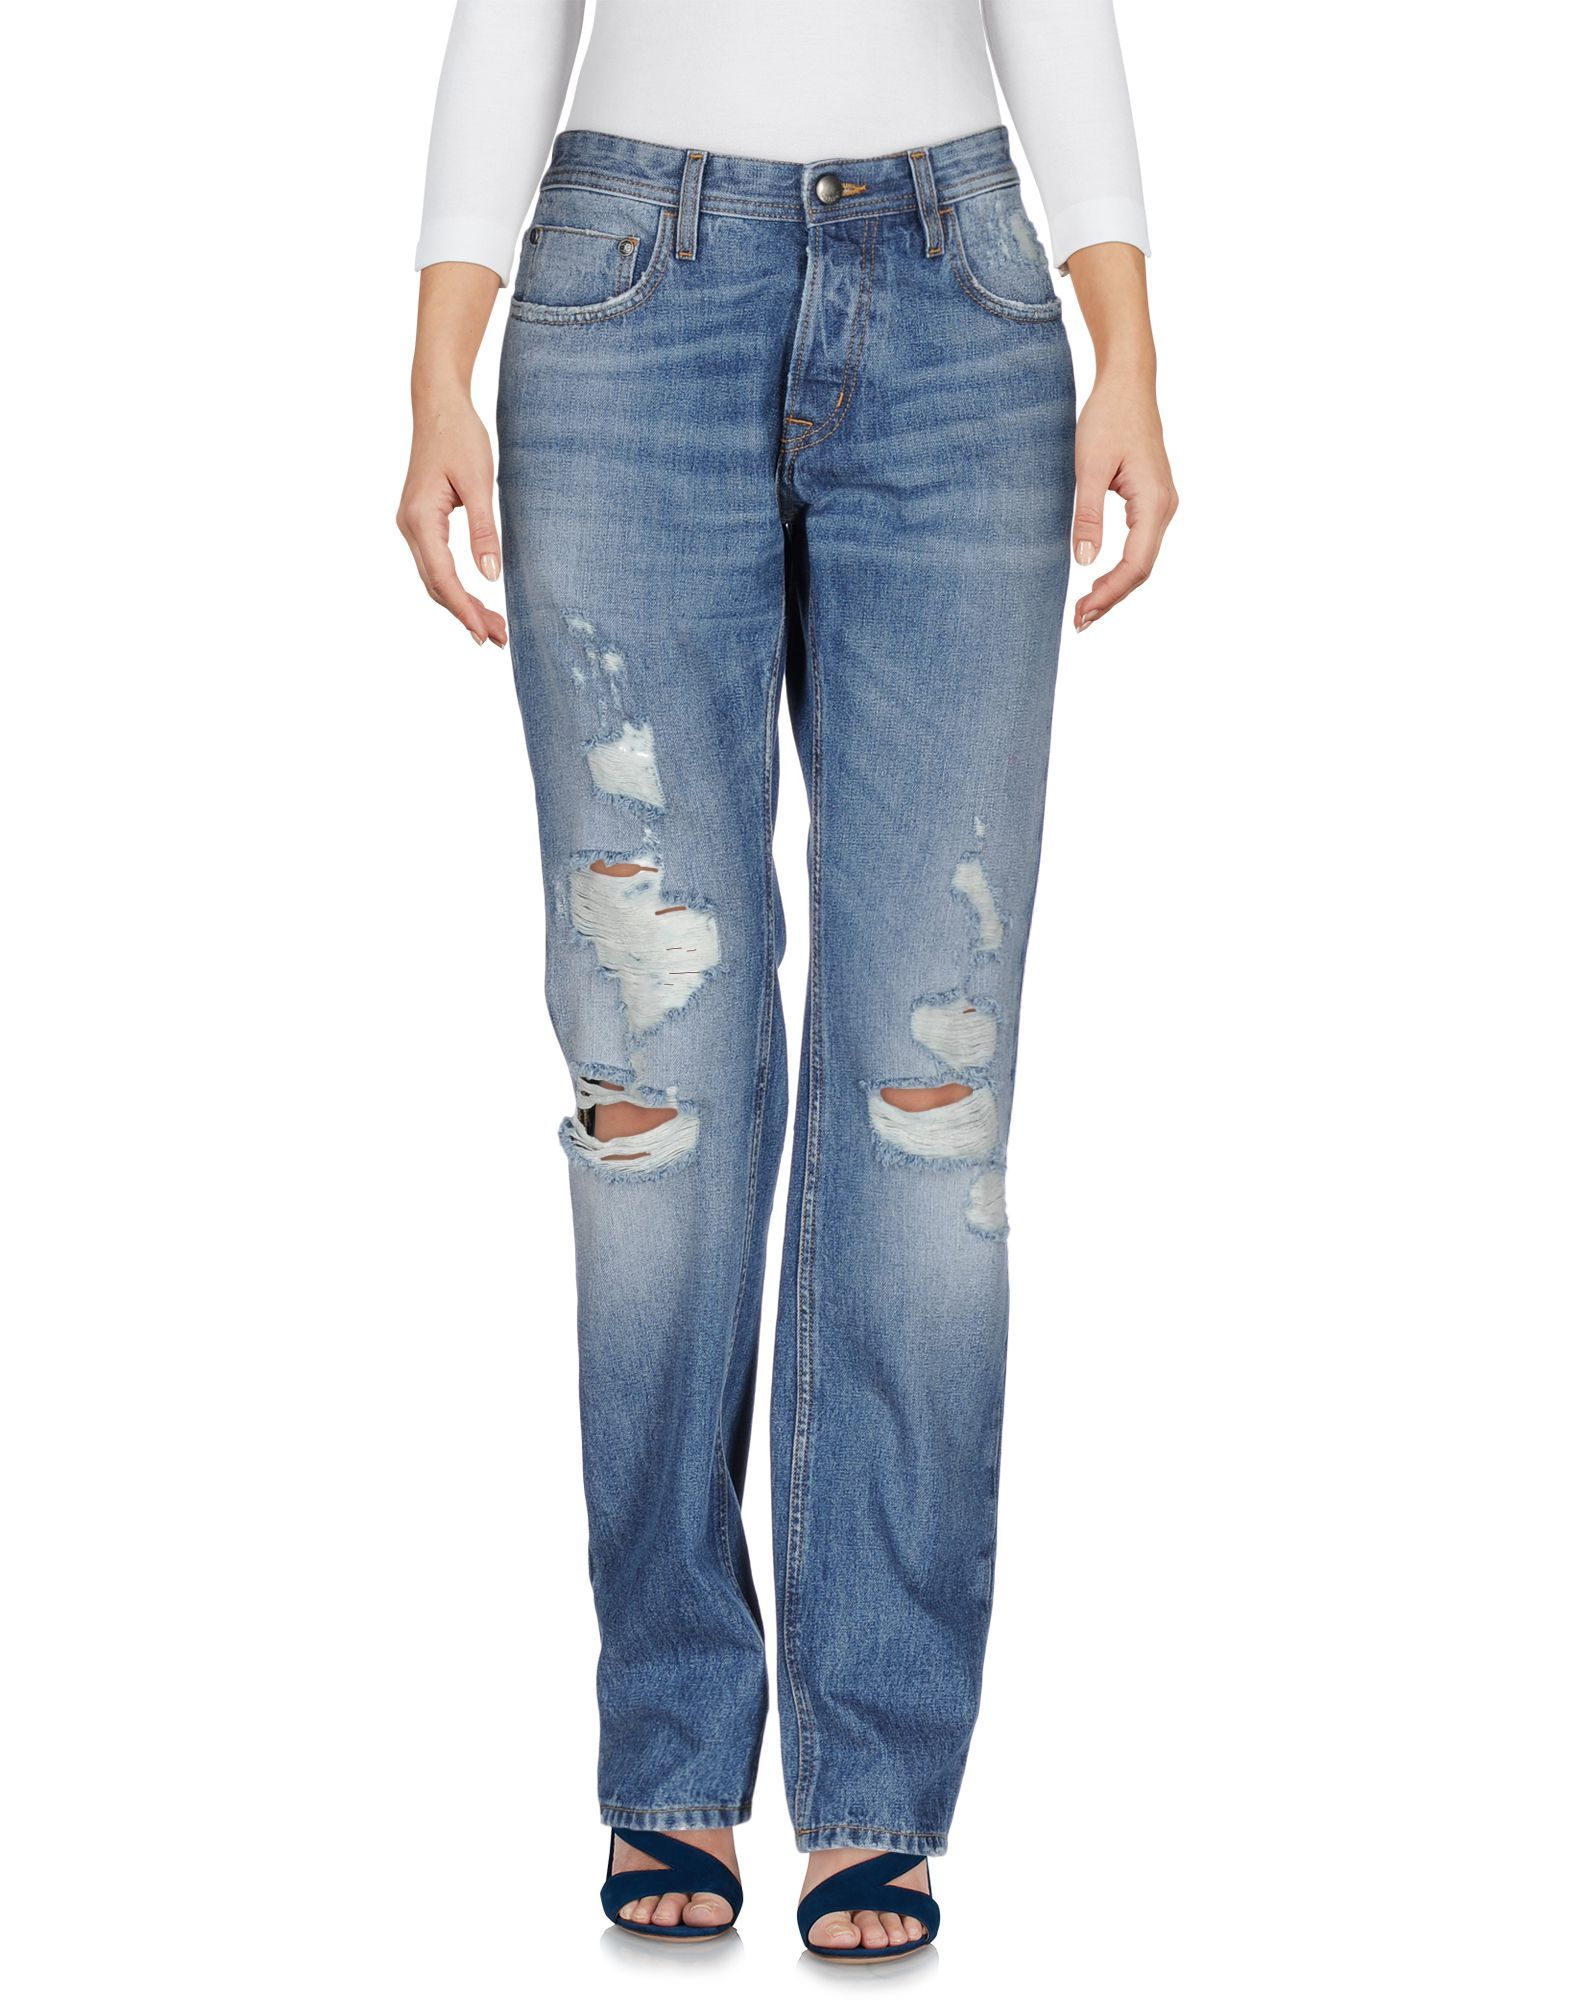 Just Cavalli Blue Cotton Jeans